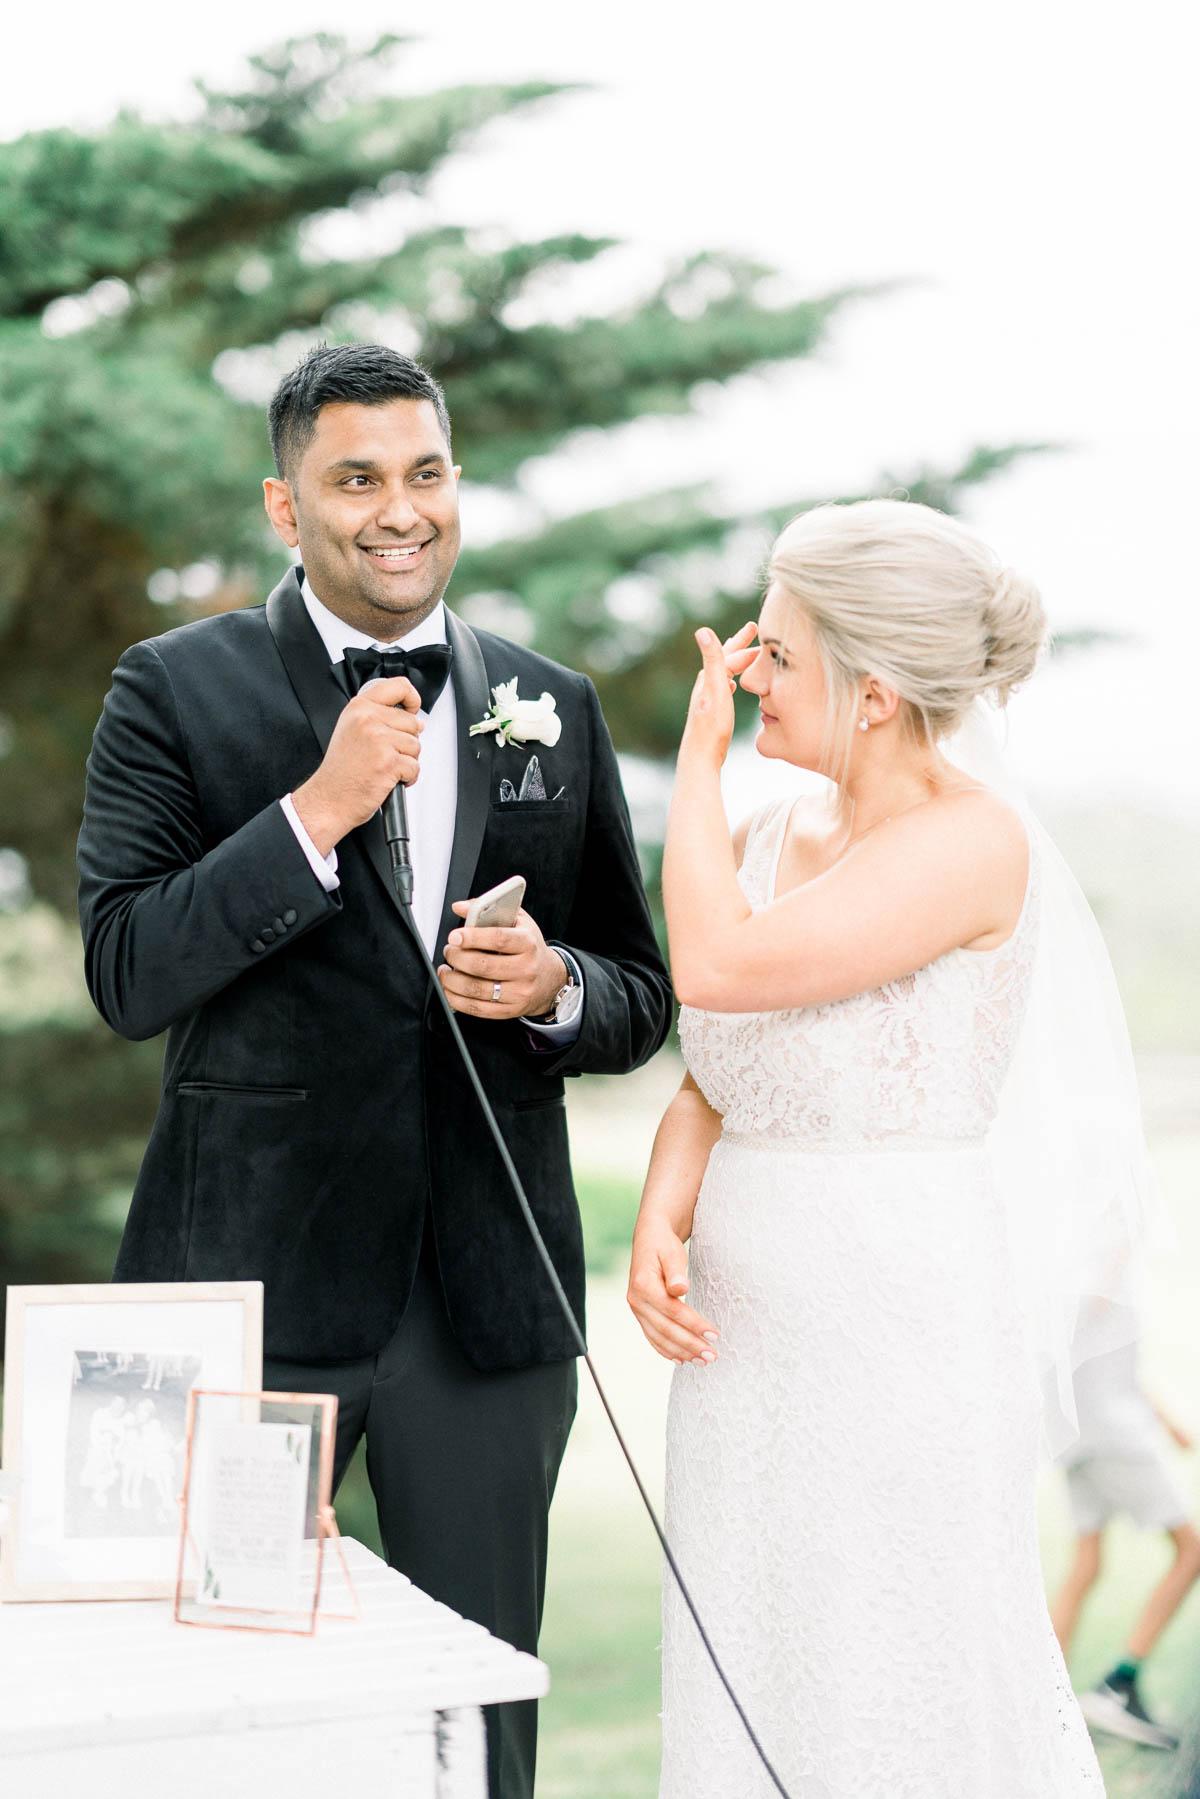 trenavin-chapel-phillip-island-wedding-heart+soul-weddings-sally-sean-00722.jpg